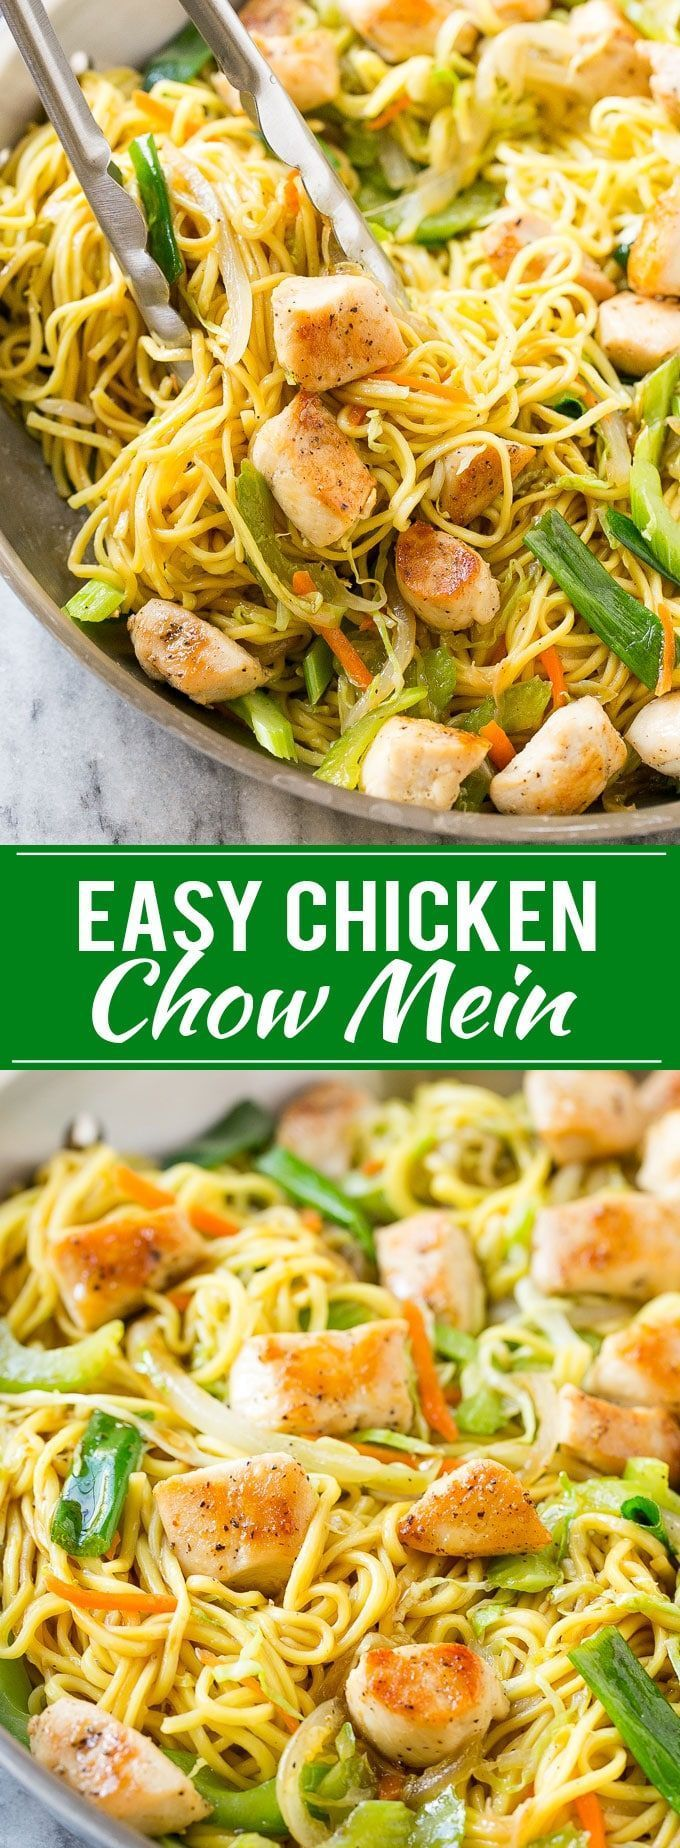 Chicken chow mein recipe chicken chow mein easy chicken chicken chow mein easy chicken recipeseasy recipeshealthy recipesasian recipeseasy chinese food forumfinder Image collections